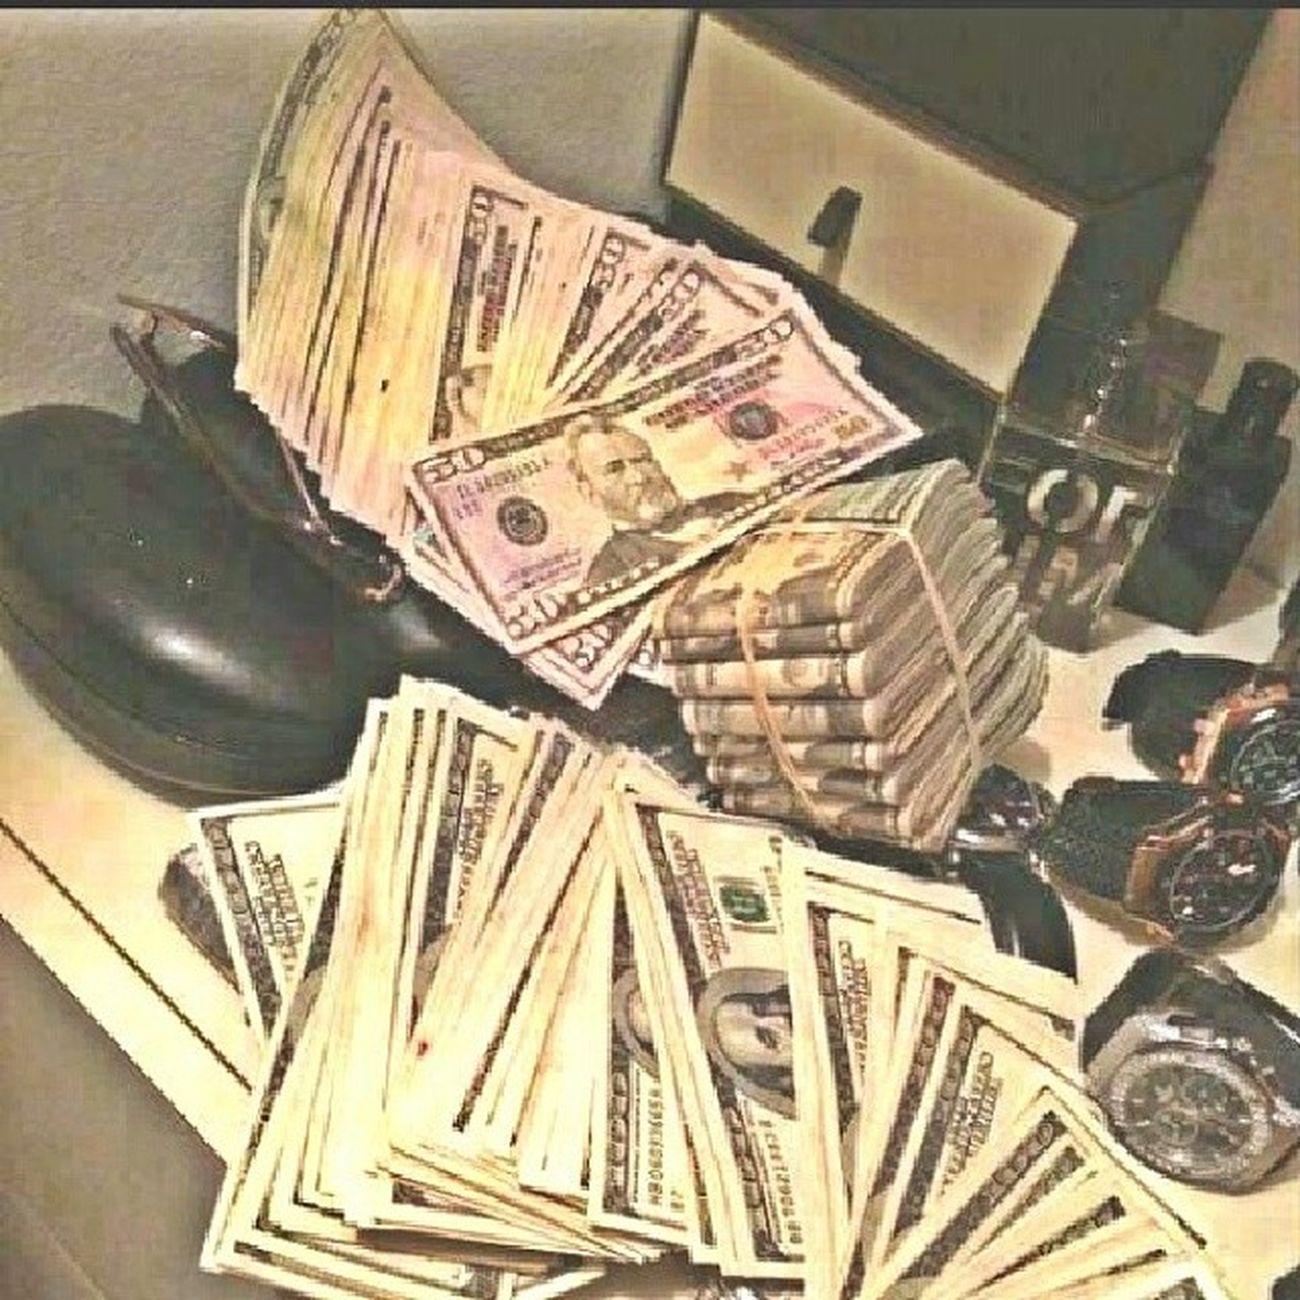 I ain't counting money no more if it ain't right, it ain't right, RickRozayVoice O✘O